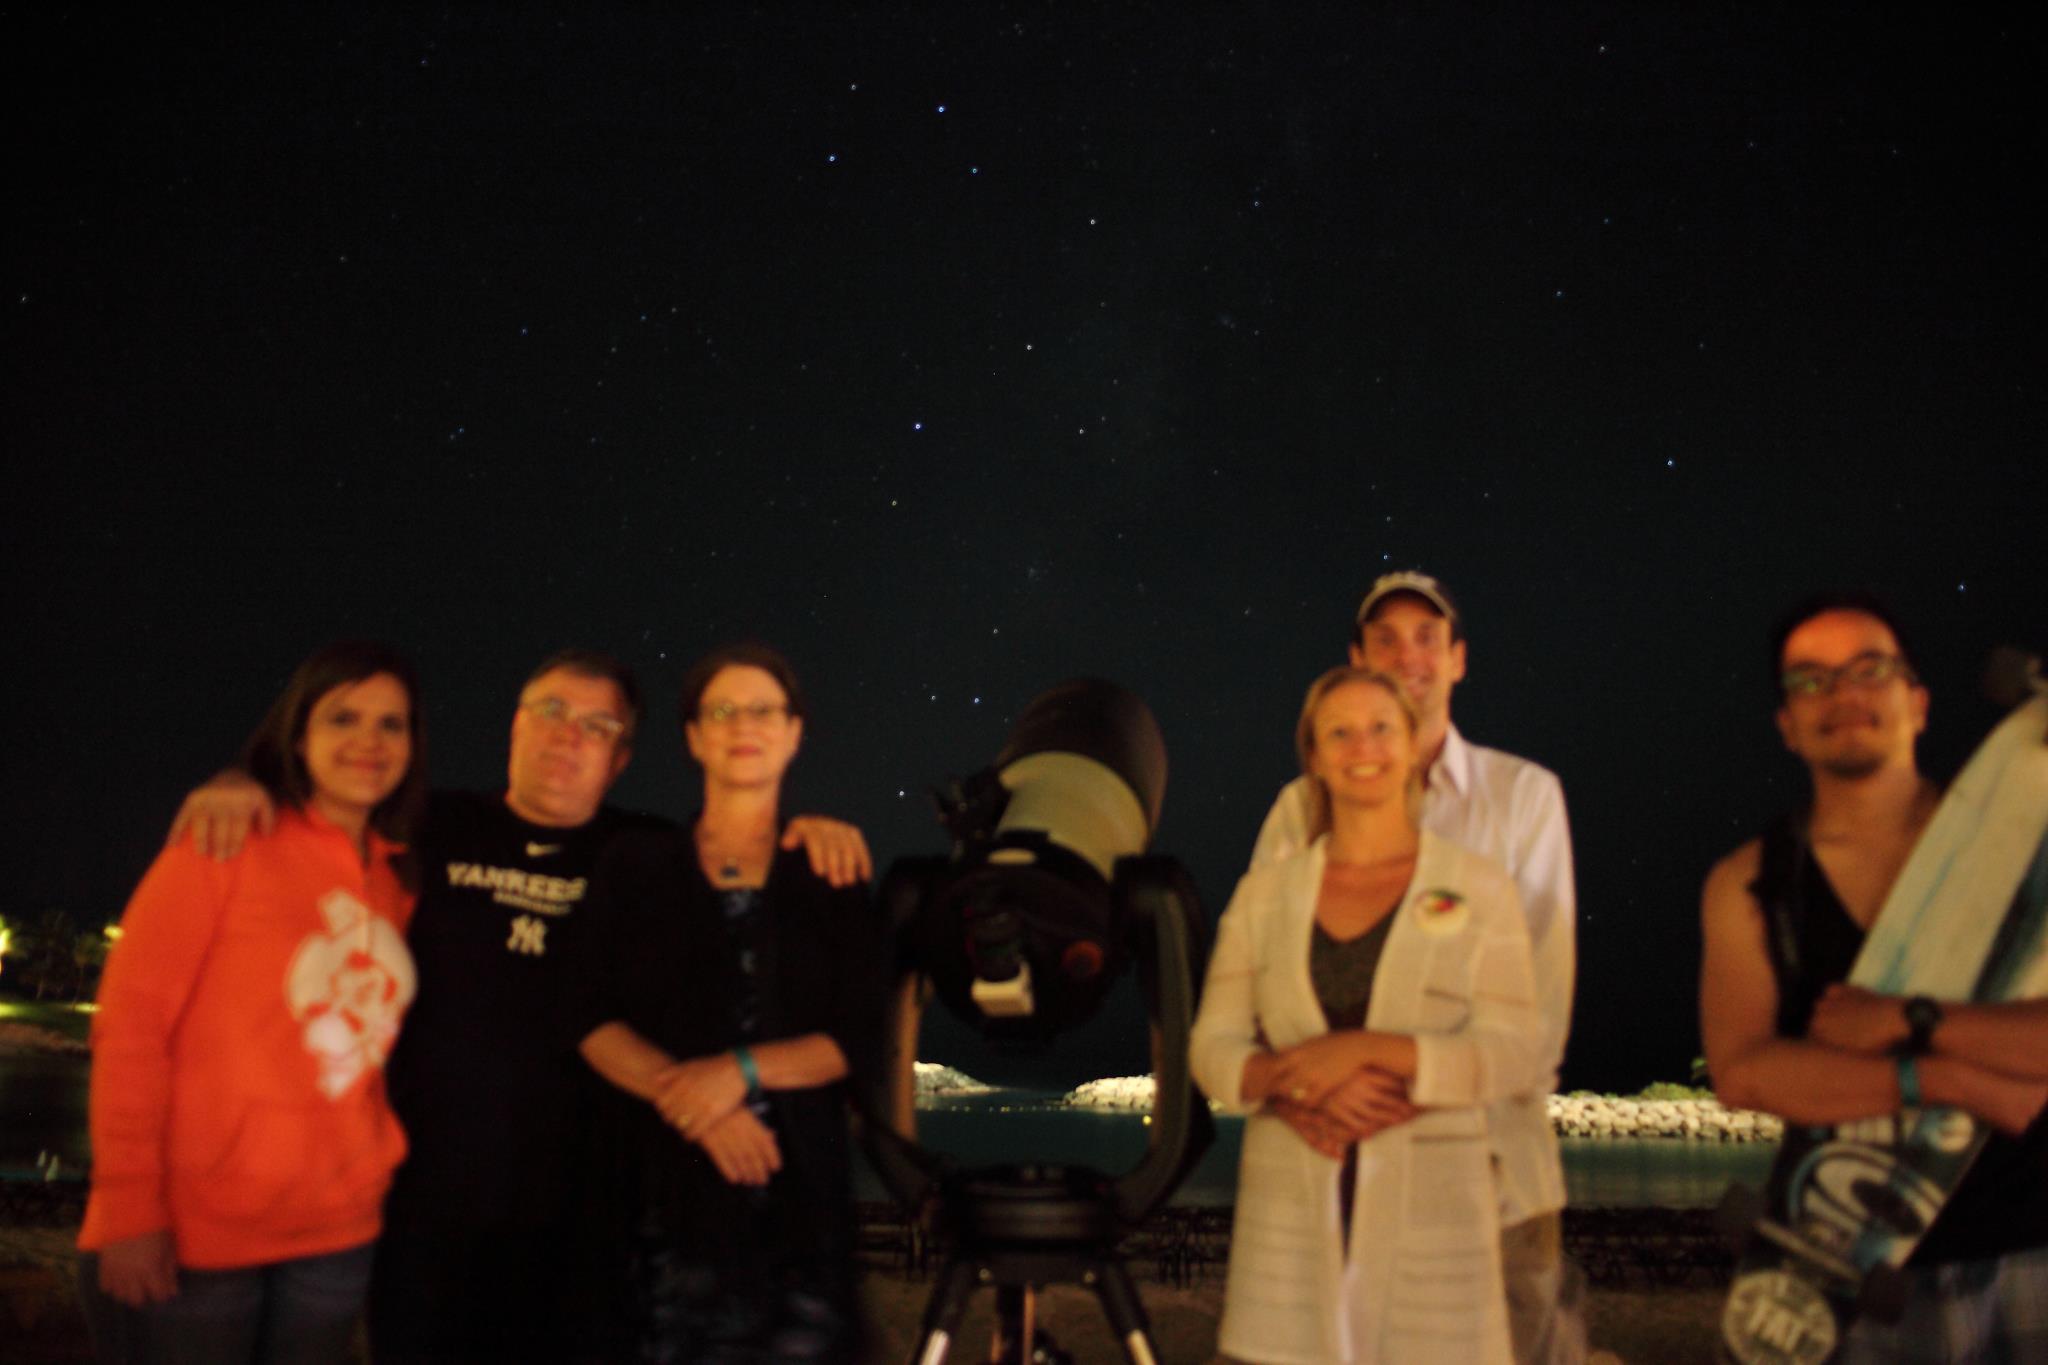 Beach Star Gazing ! - Milky Way band in background !